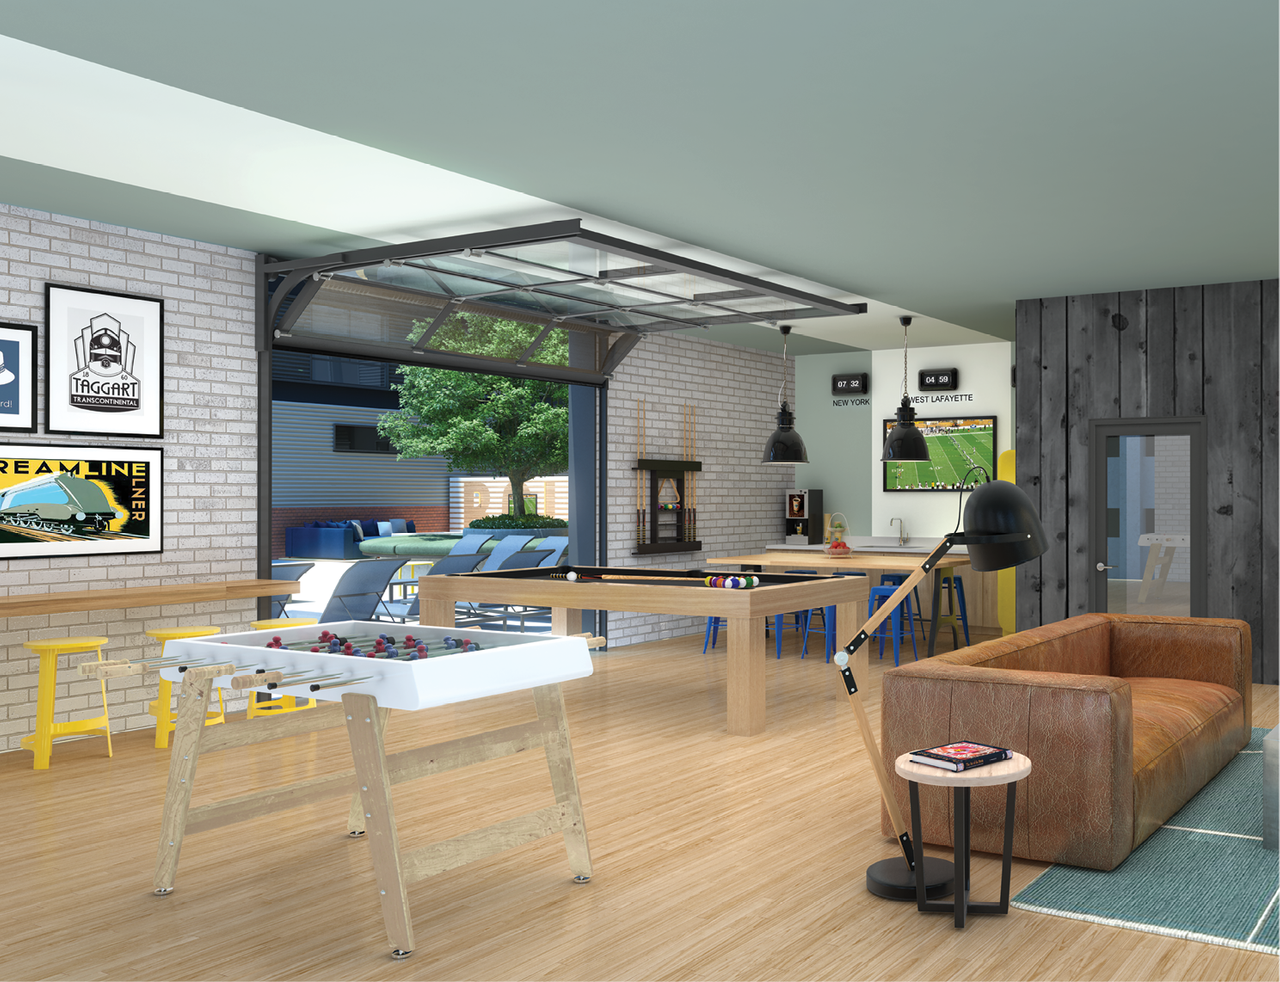 hub west lafayette west lafayette student housing. Black Bedroom Furniture Sets. Home Design Ideas